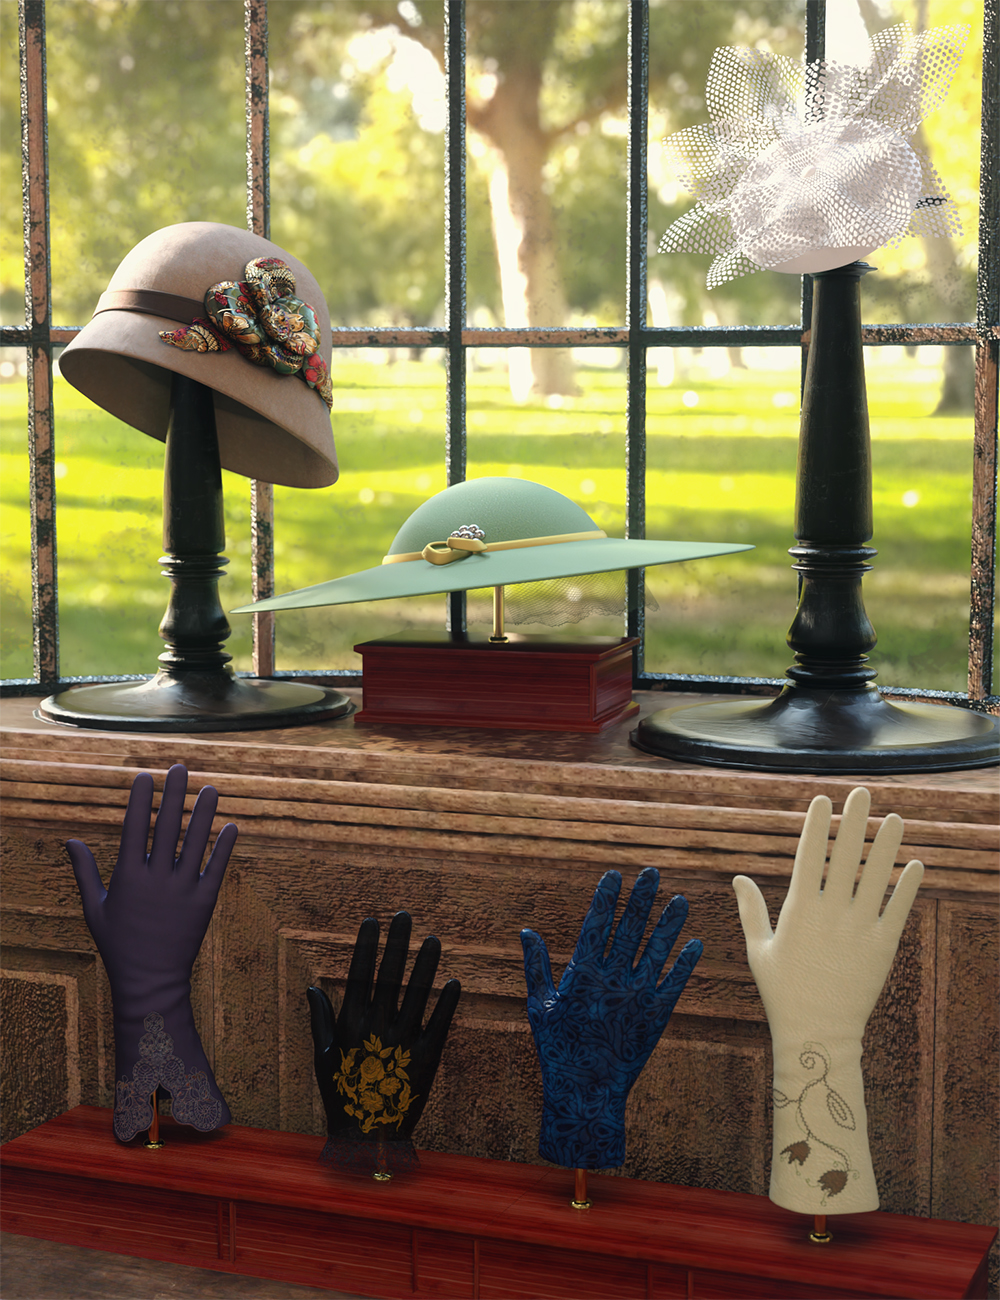 Vintage Hats and Gloves for Genesis 8 and 8.1 Females by: Barbara BrundonUmblefuglySade, 3D Models by Daz 3D